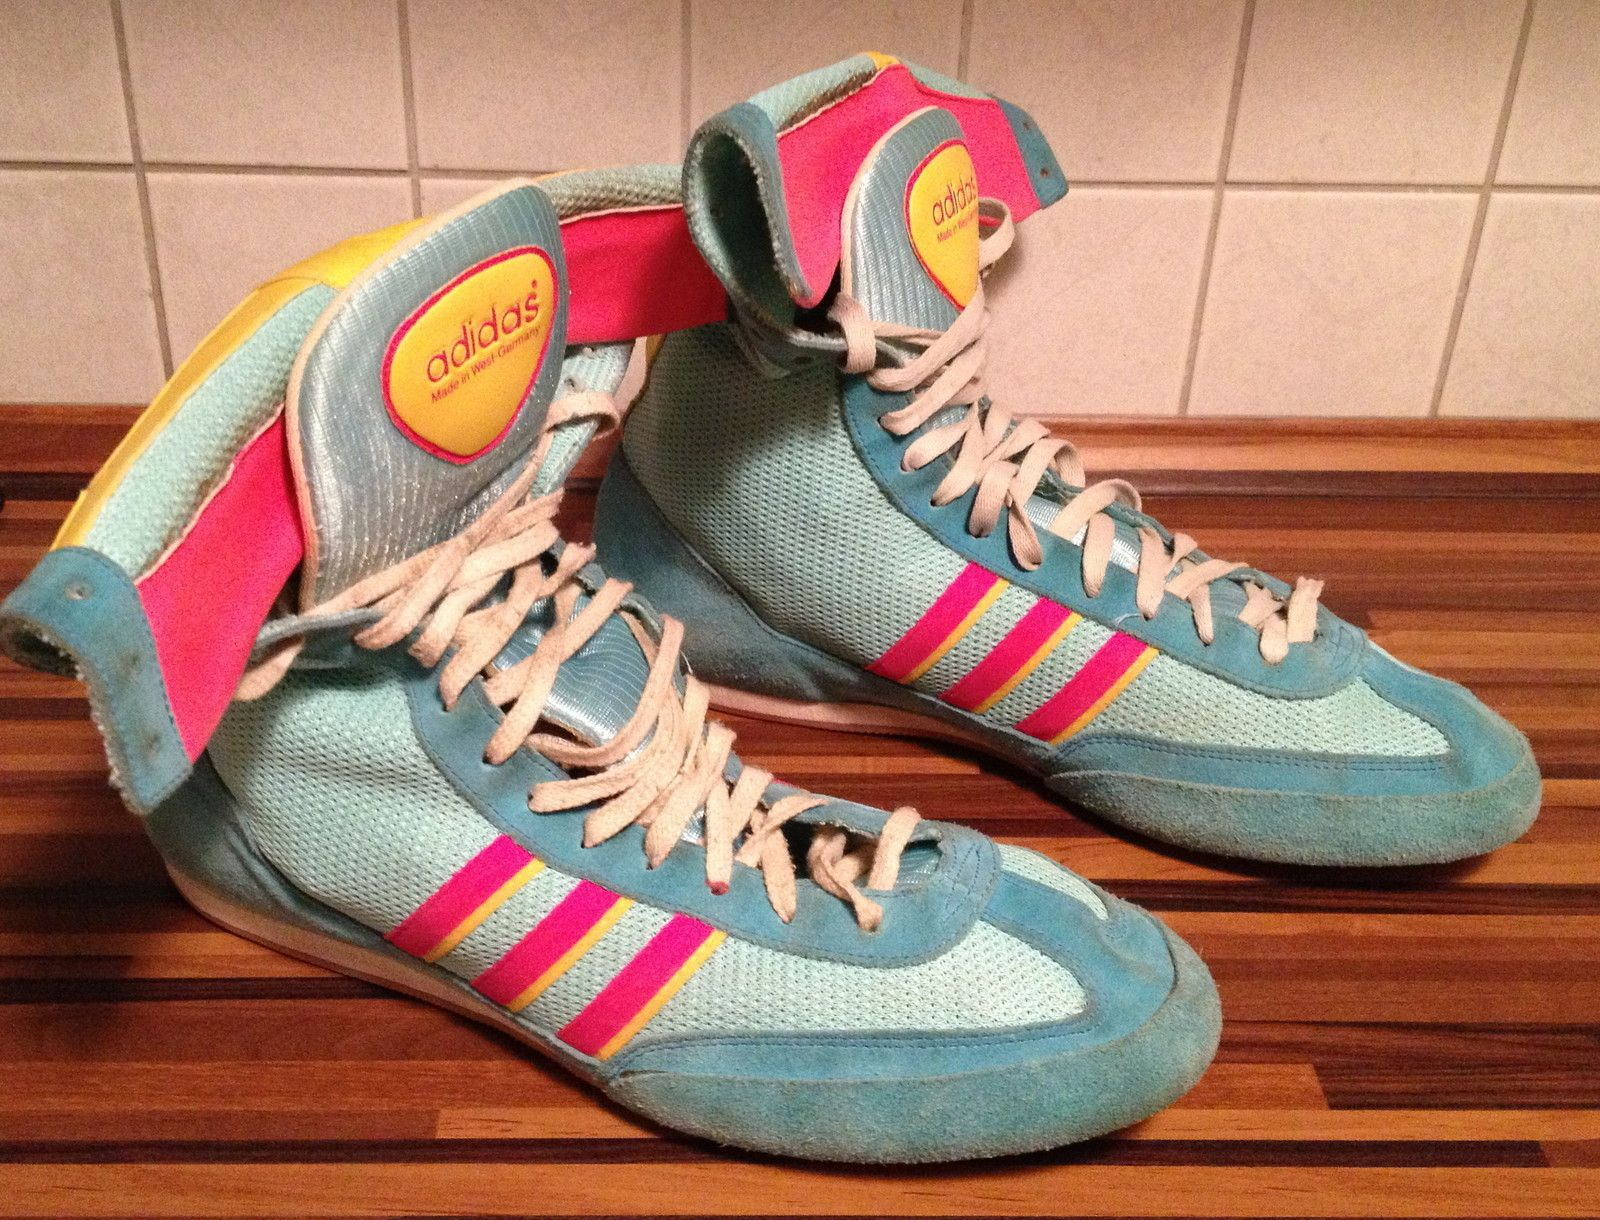 Vintage Adidas Boots West Germany 80s US11 5 Wrestling Boxing Combat  Freistil